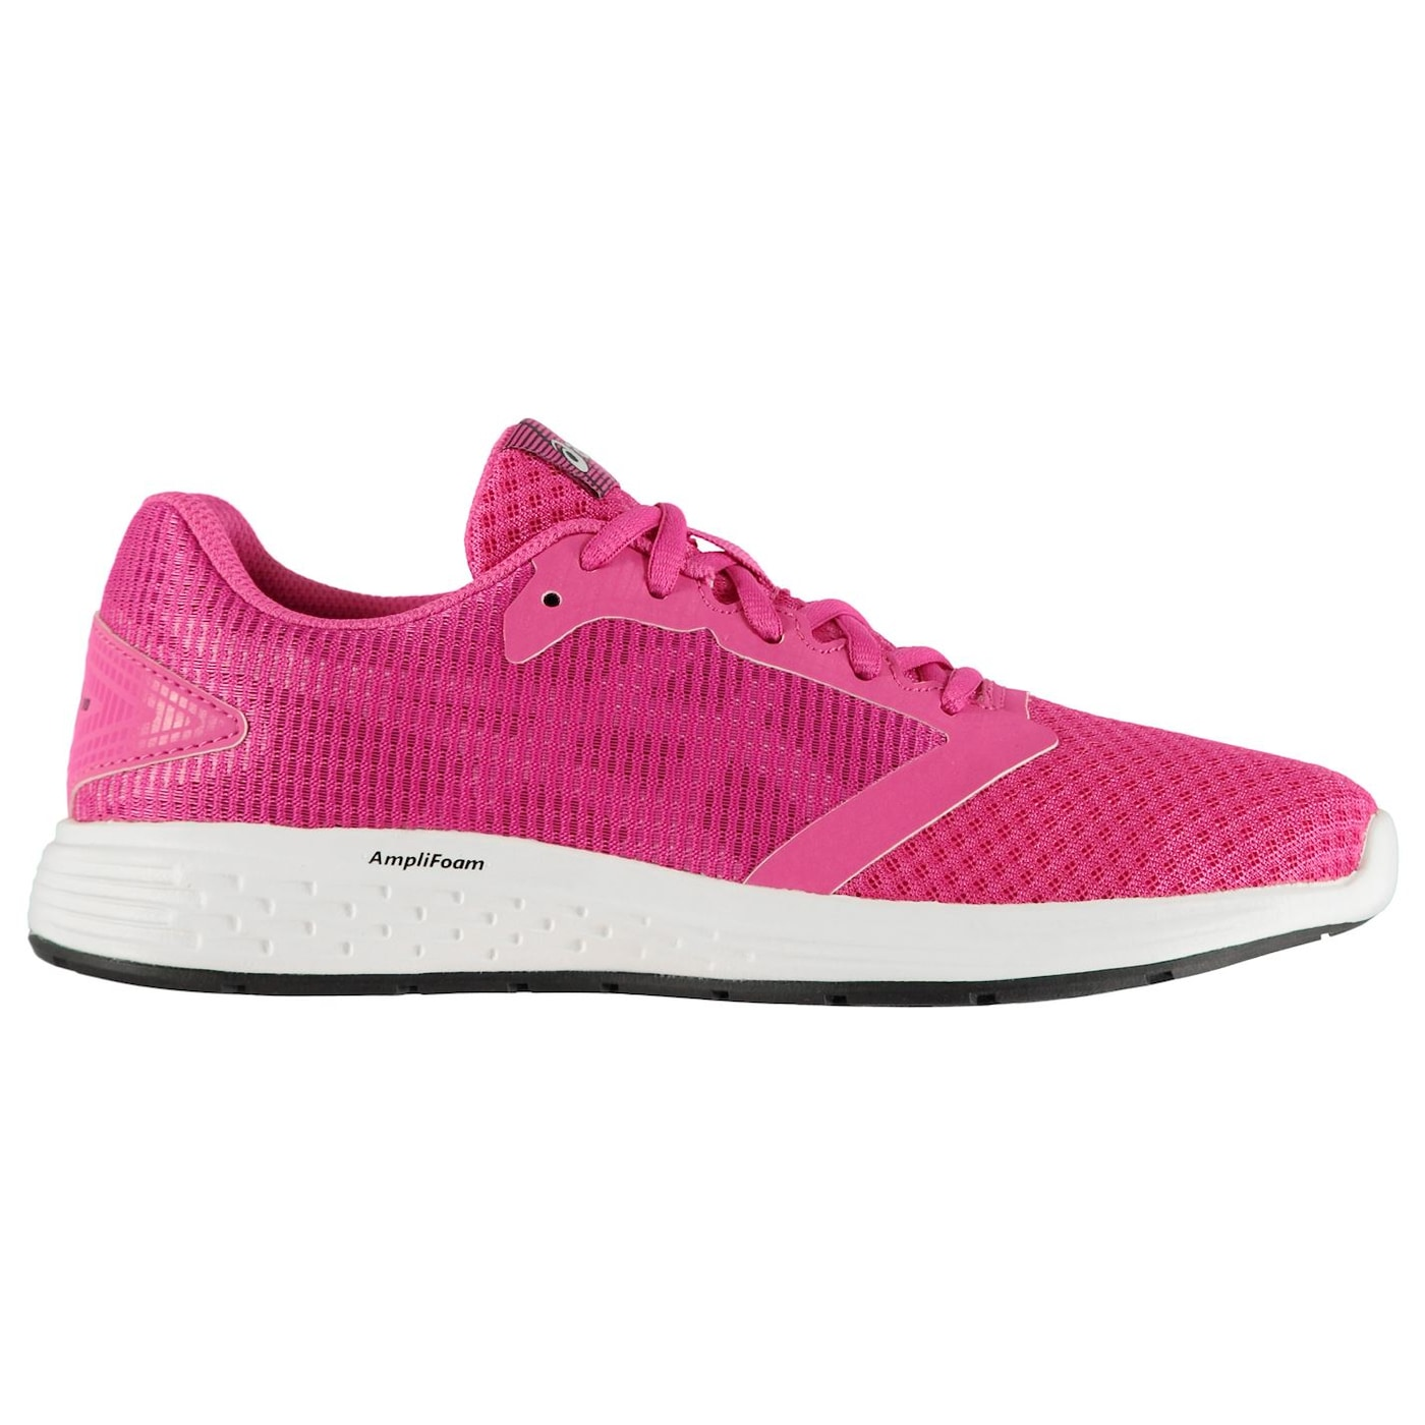 boty Nike Flex Experience Running Shoes dámské